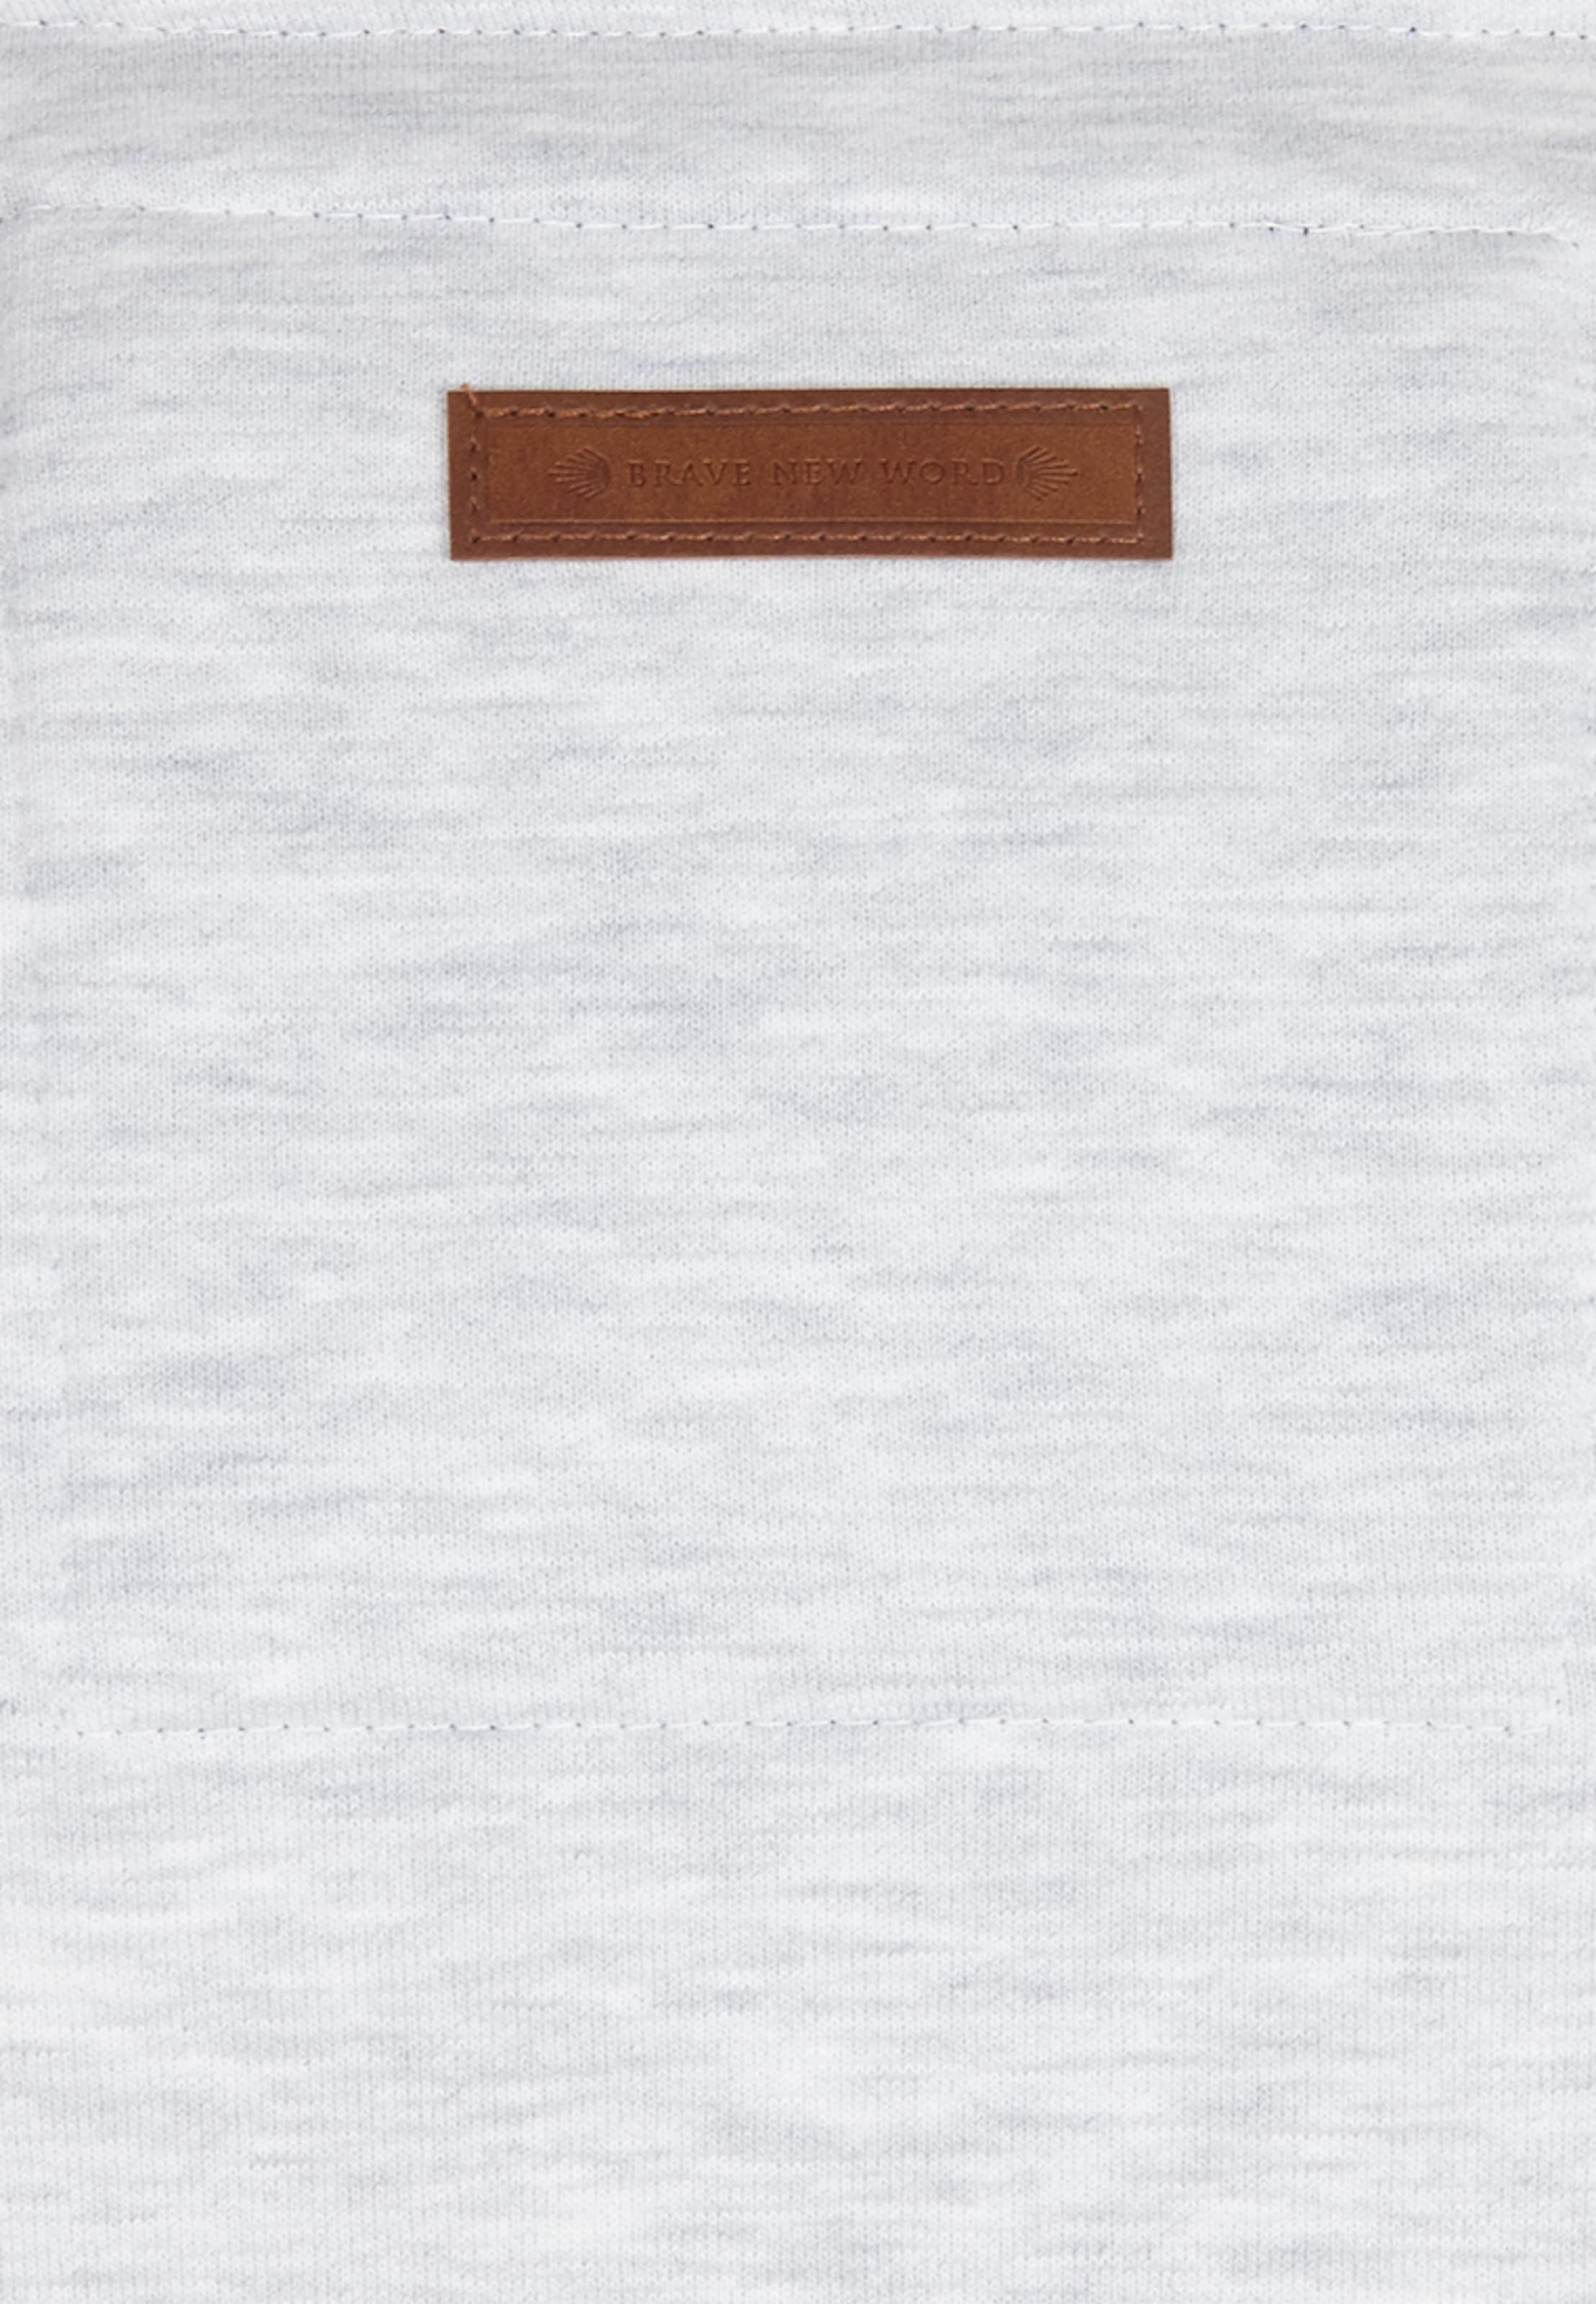 'Birol VI' naketano naketano Zipped Jeck Zipped Jacket xHqFU